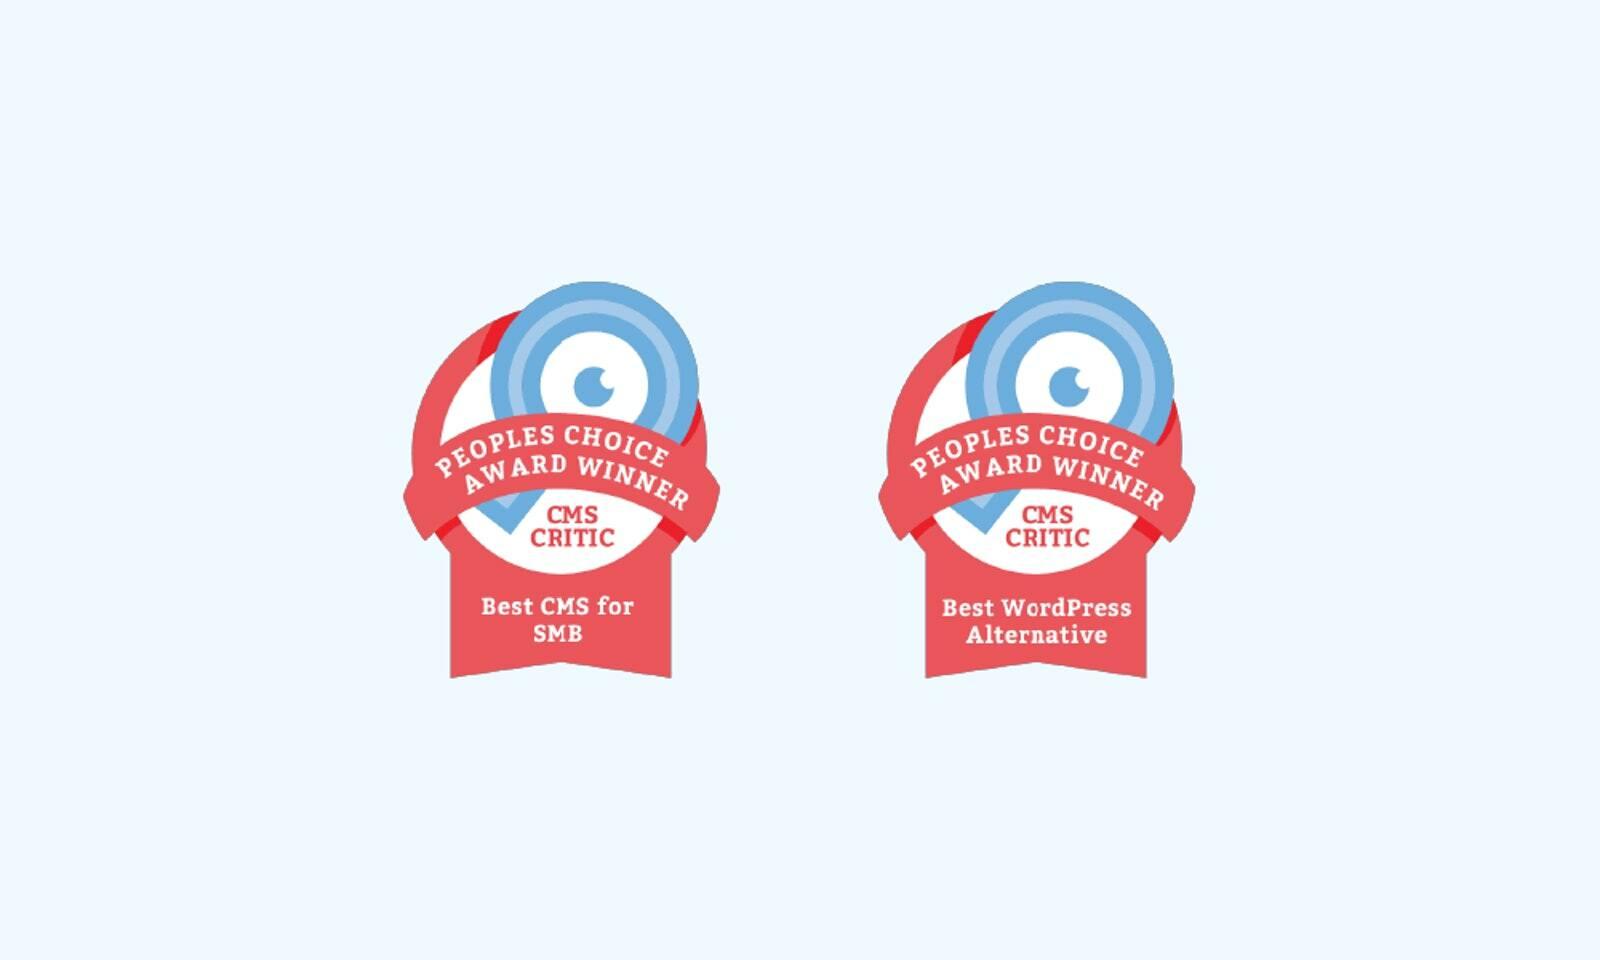 Craft CMS Awards: Best CMS for SMB, and Best WordPress Alternative